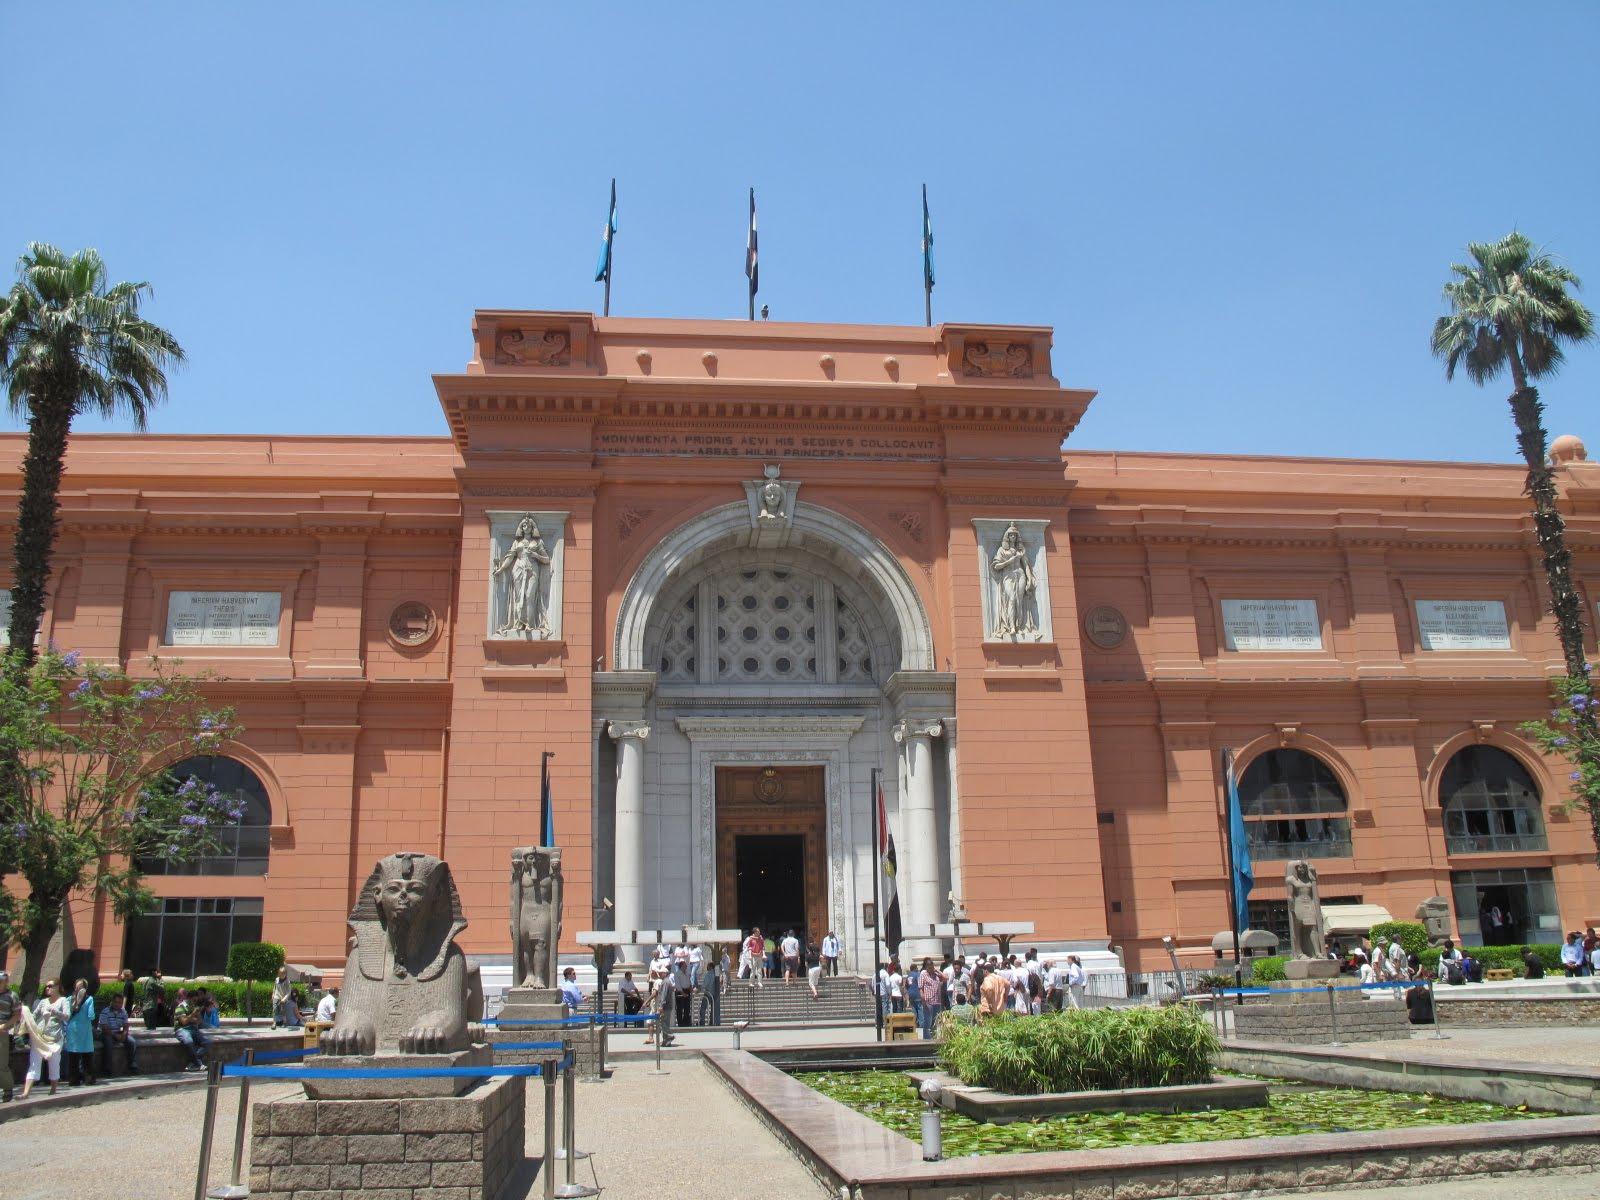 museo nacional cairo: